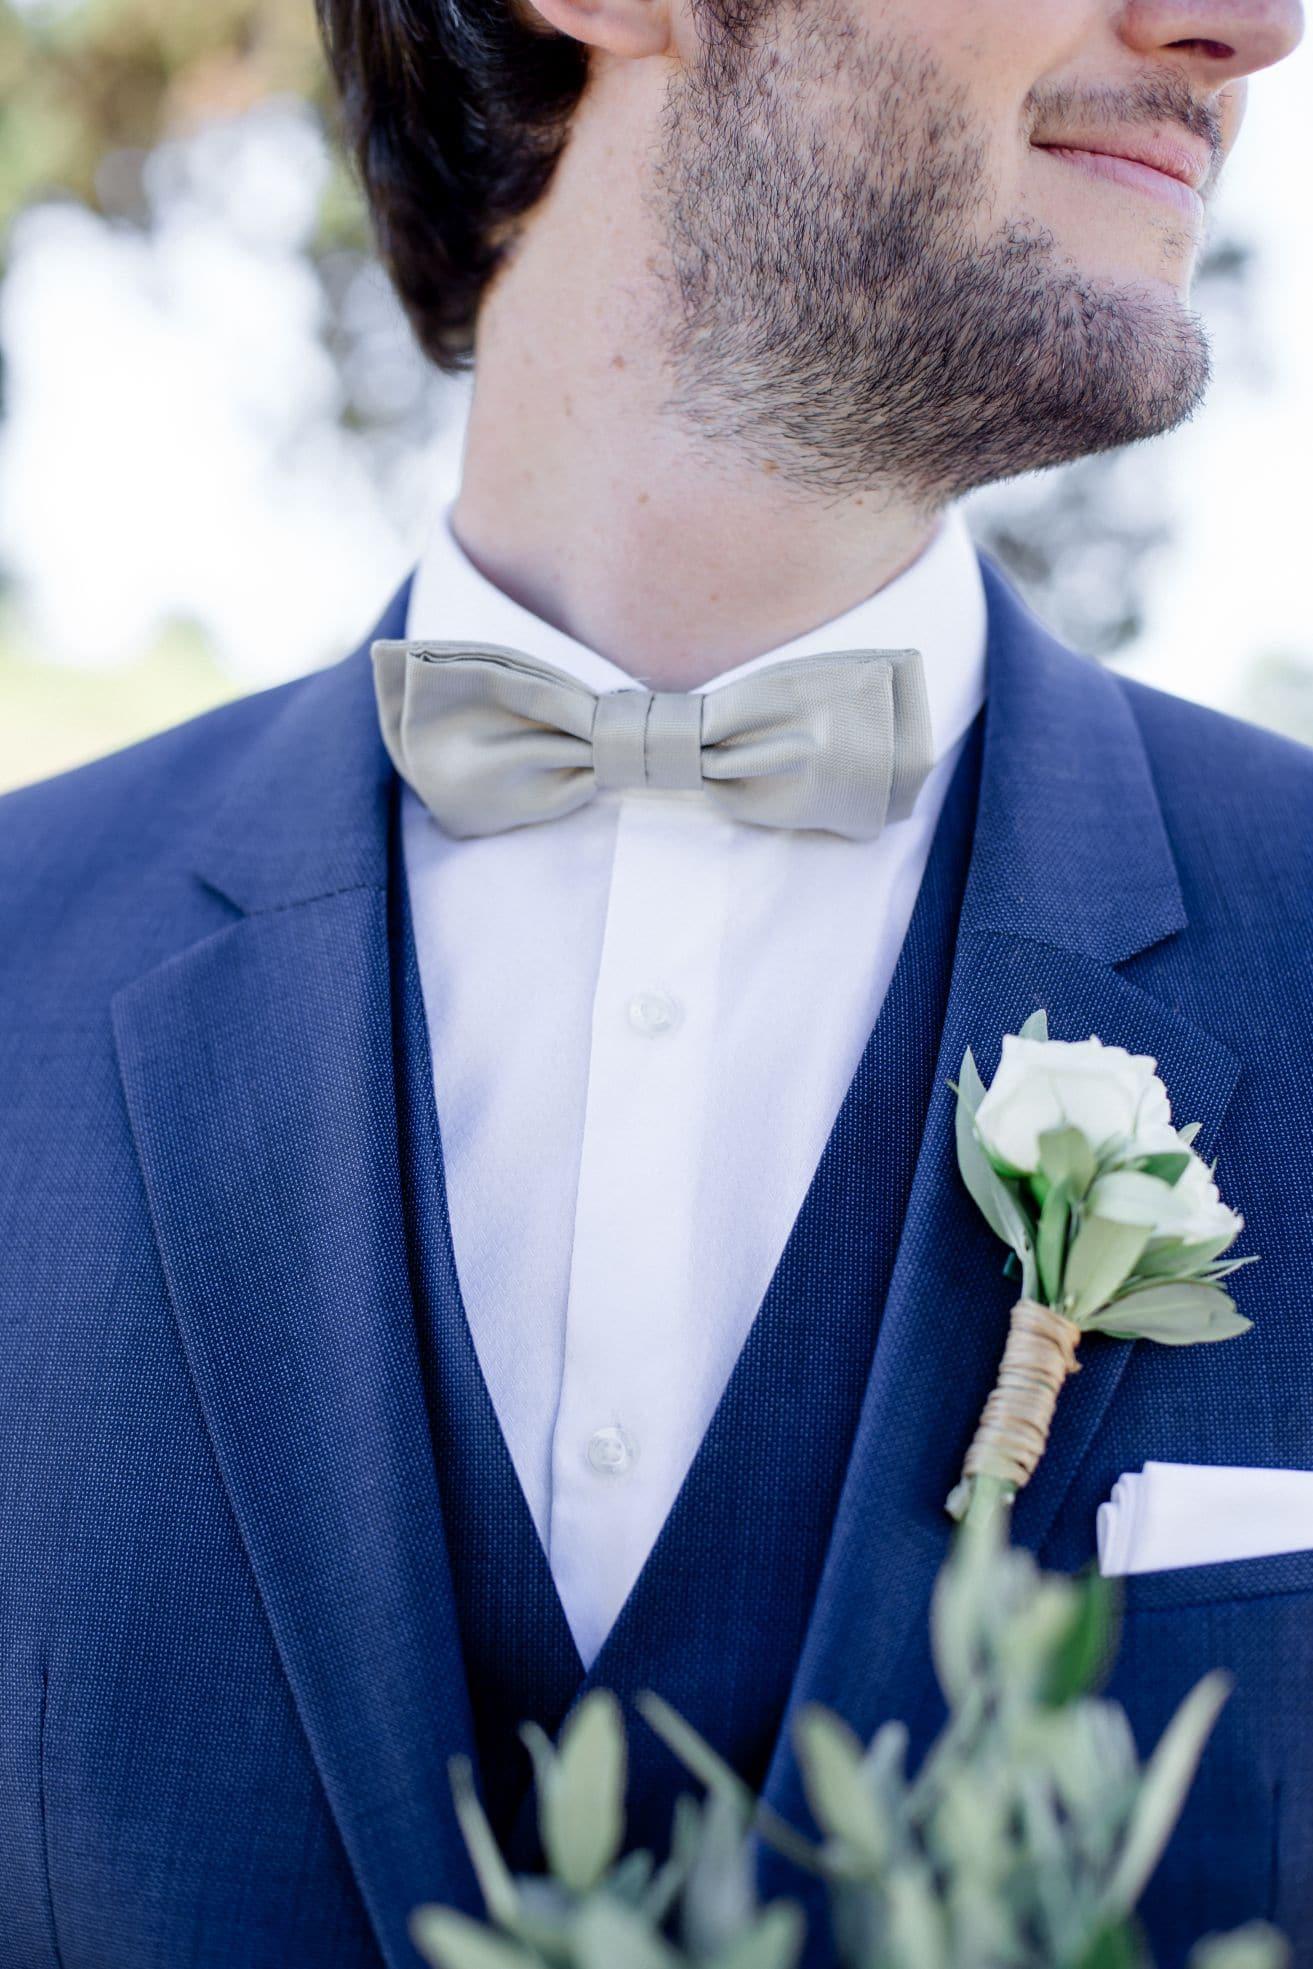 Million Memories_A&D_Hochzeitsfotograf_Schlosshochzeit_Toskana_Lago Di Como_Wedding_Tuscany_107